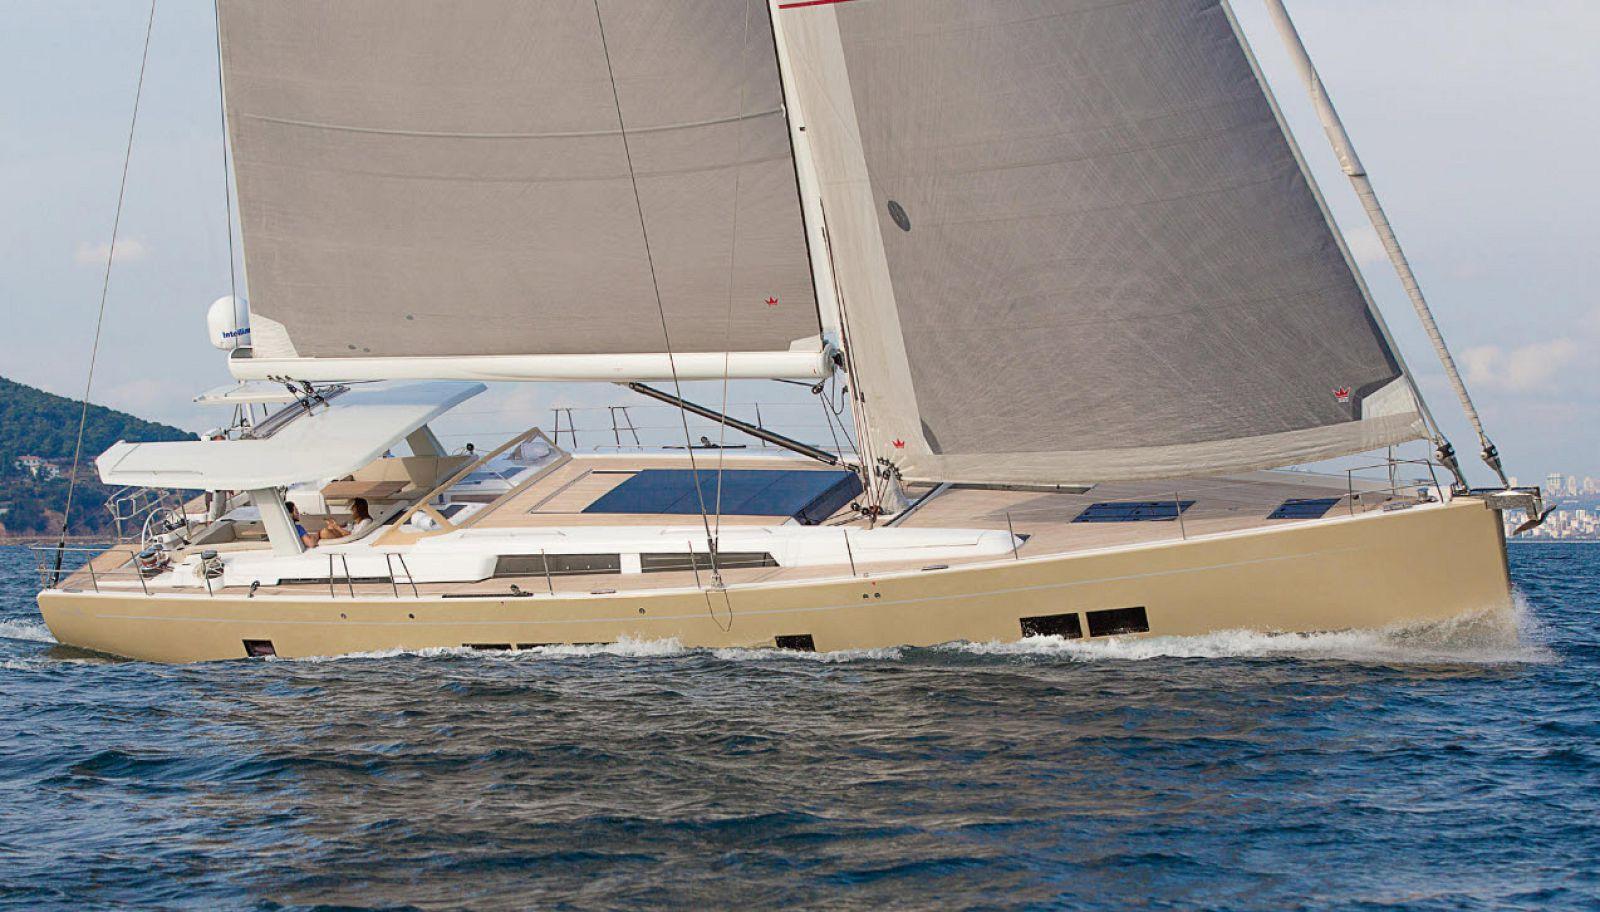 Hanse 675 Sailboat Profile